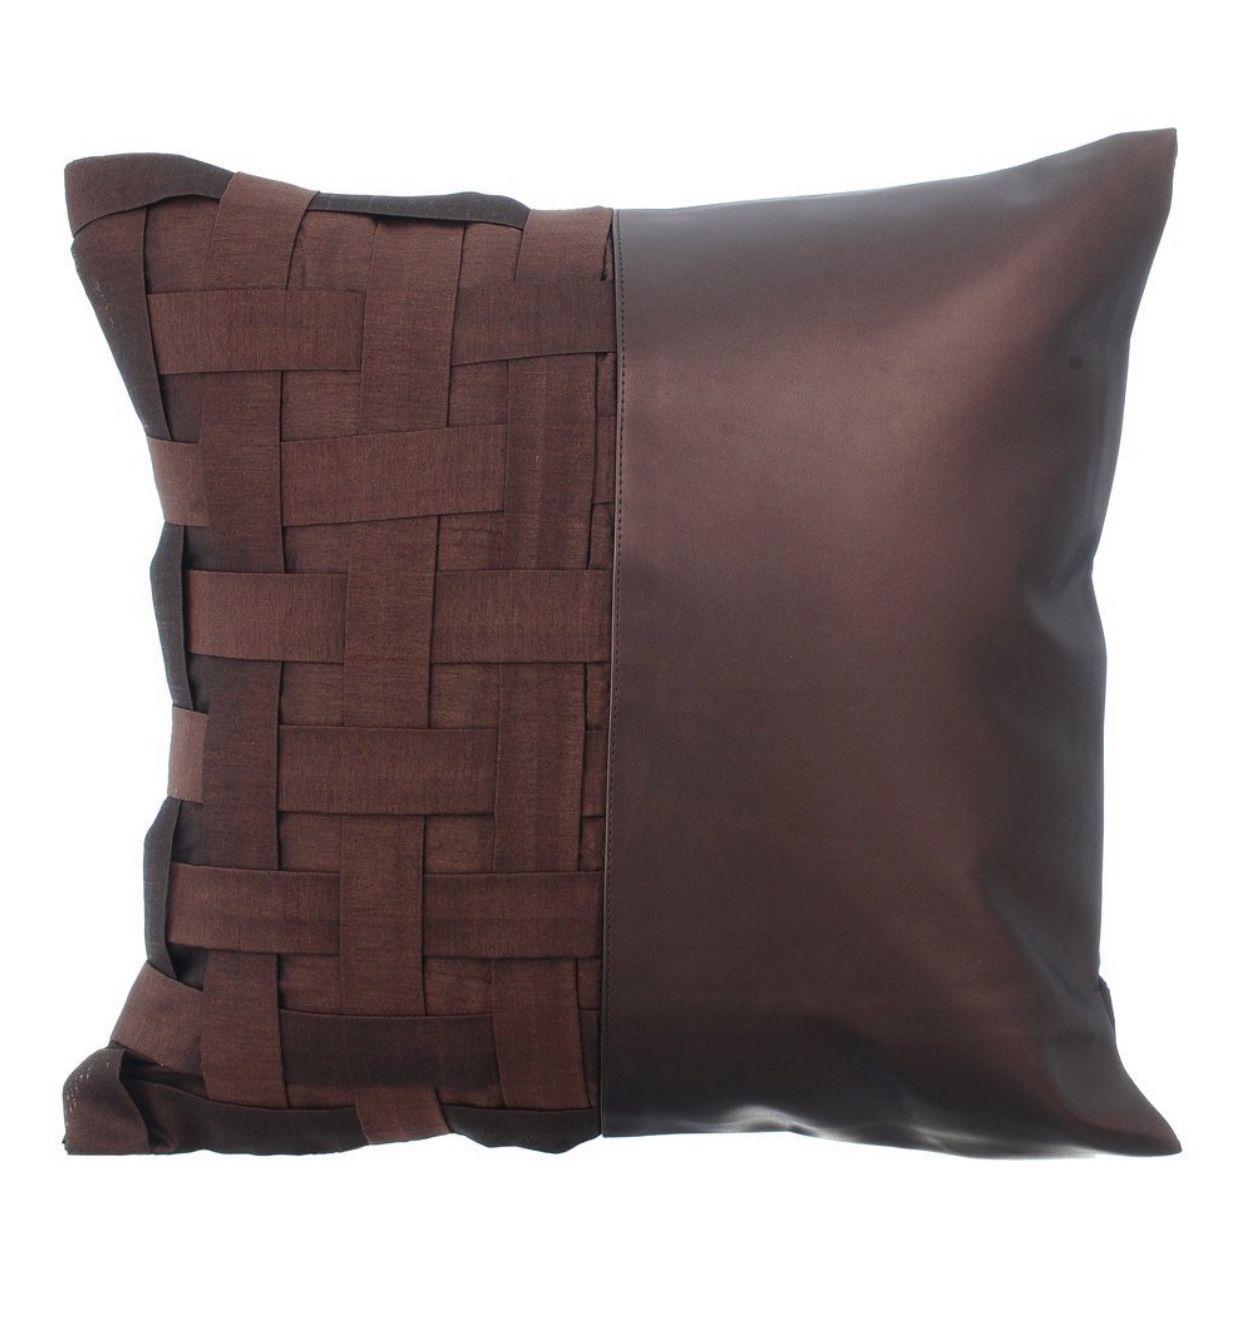 Pin By Bettina G On Pillow Leather Pillow Designer Throw Pillows Pillows